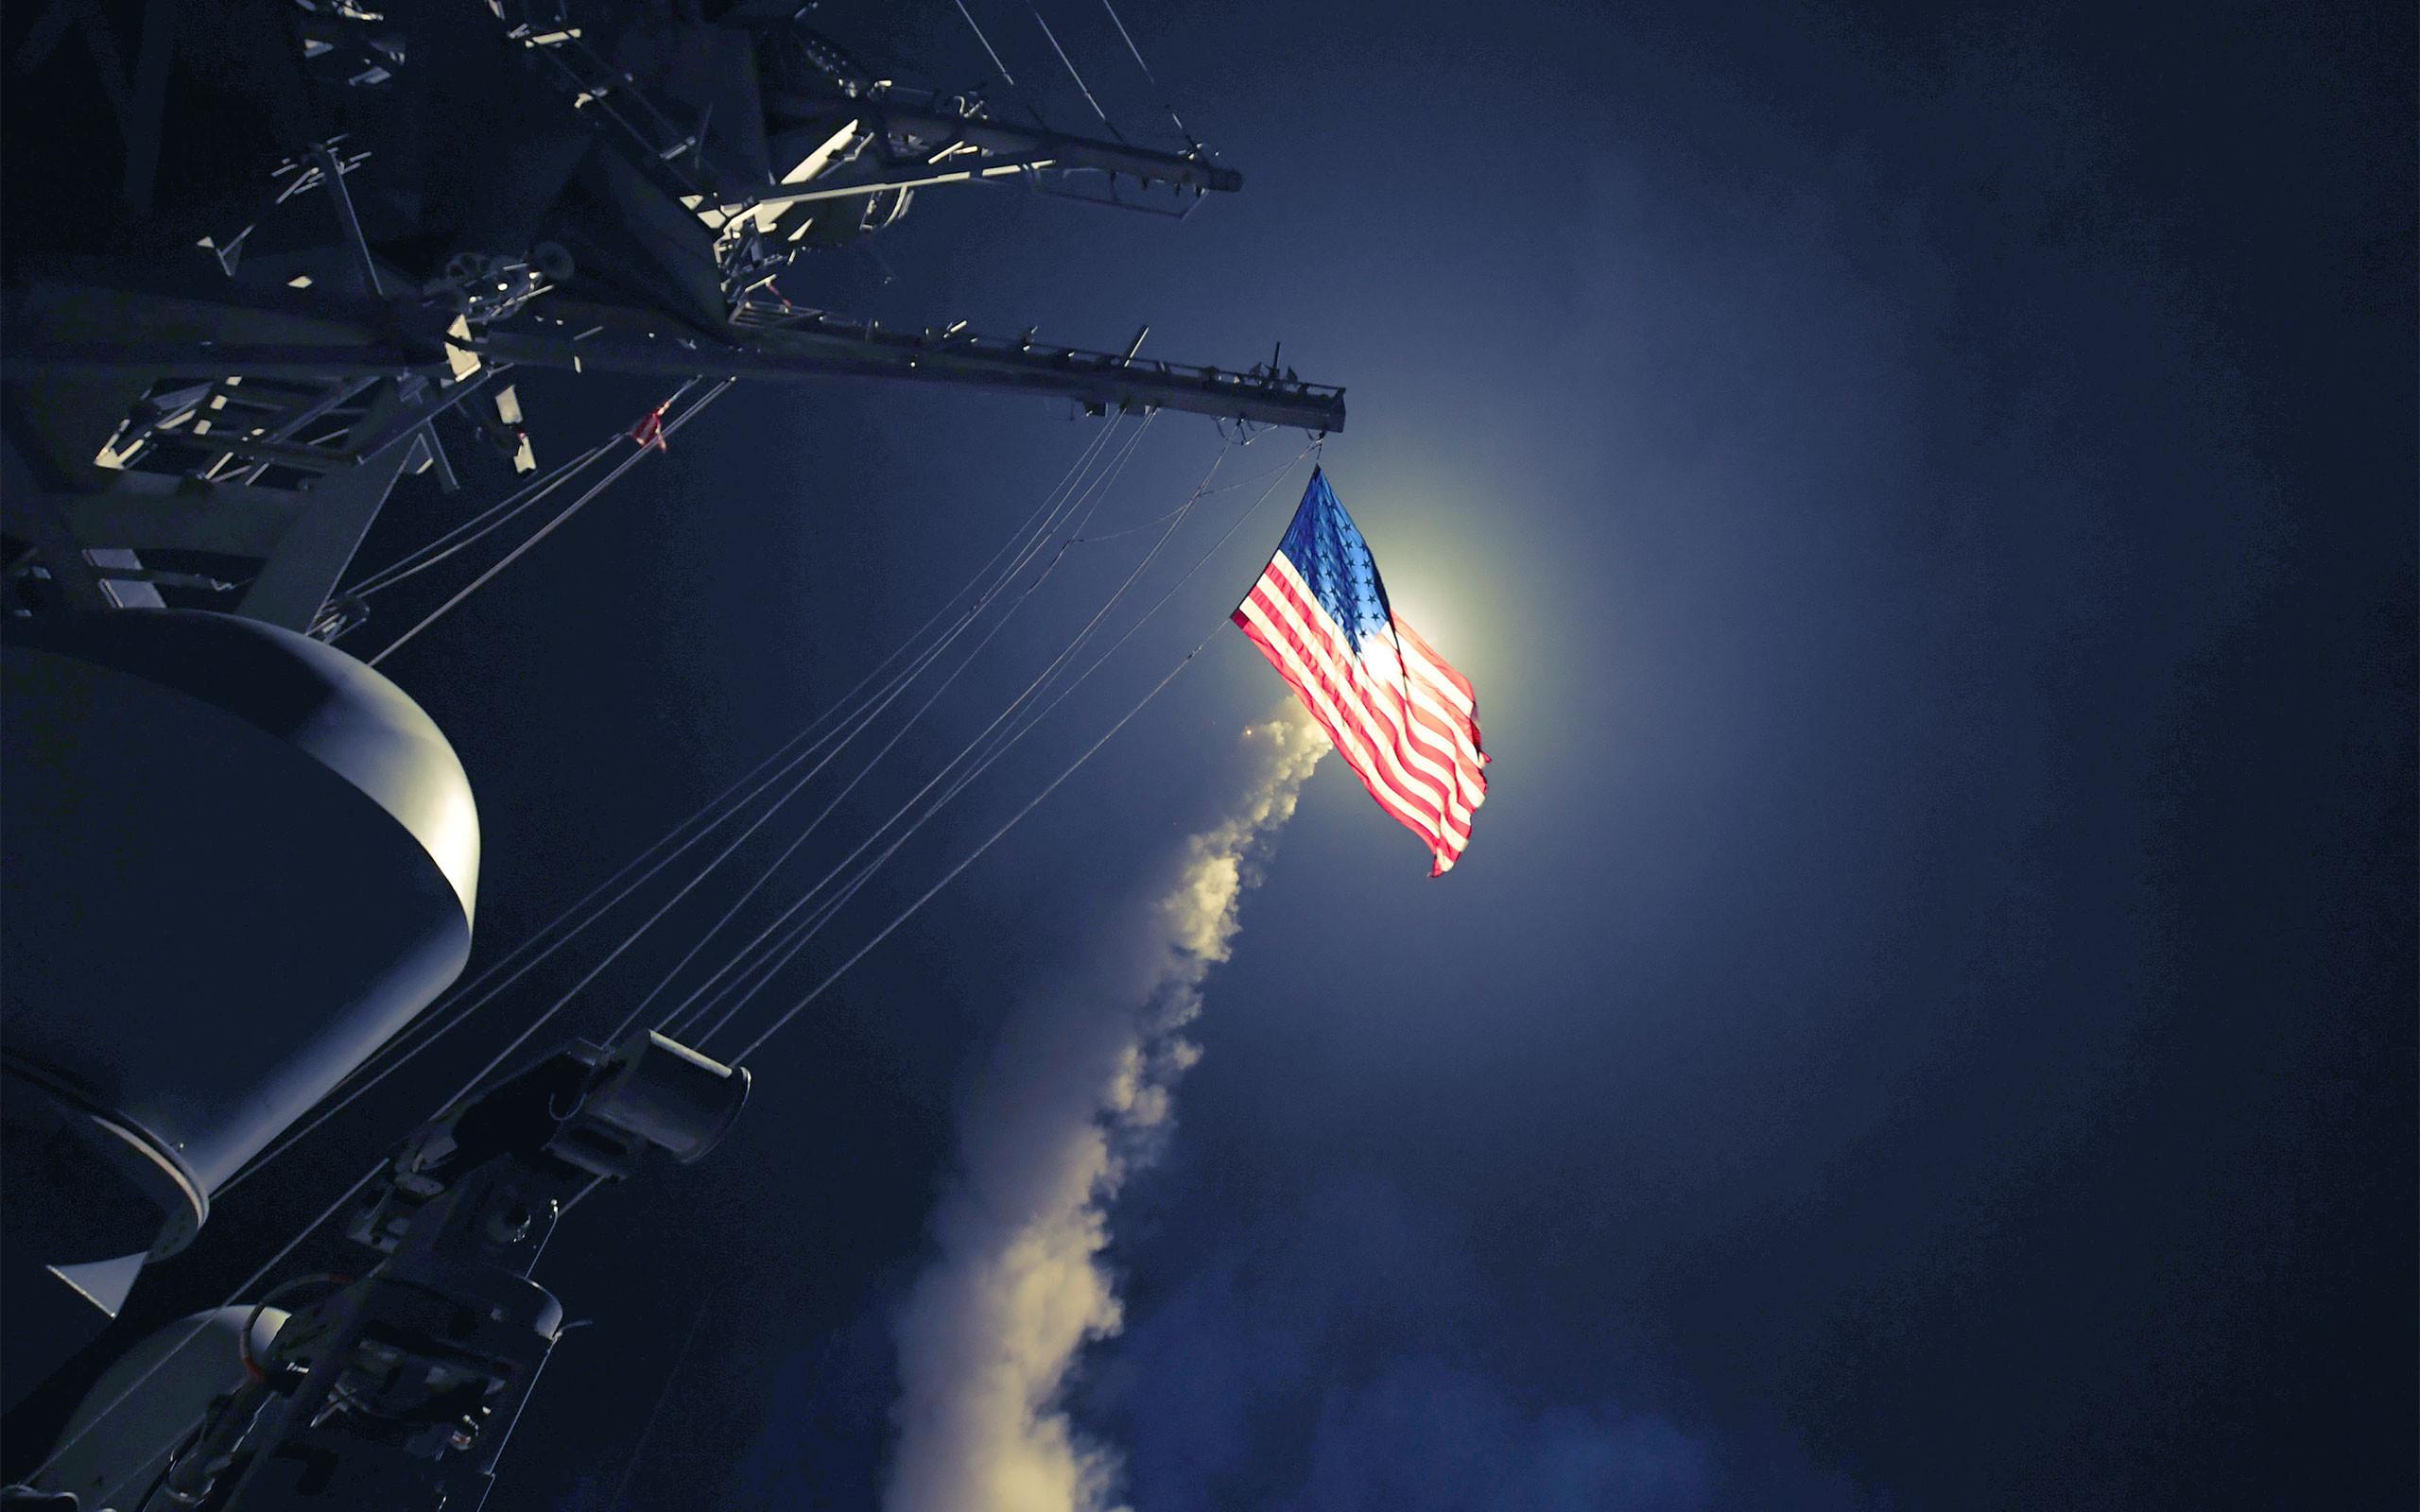 <p>Фото:&nbsp;&copy; Ford Williams/Courtesy U.S. Navy/Handout via REUTERS</p>